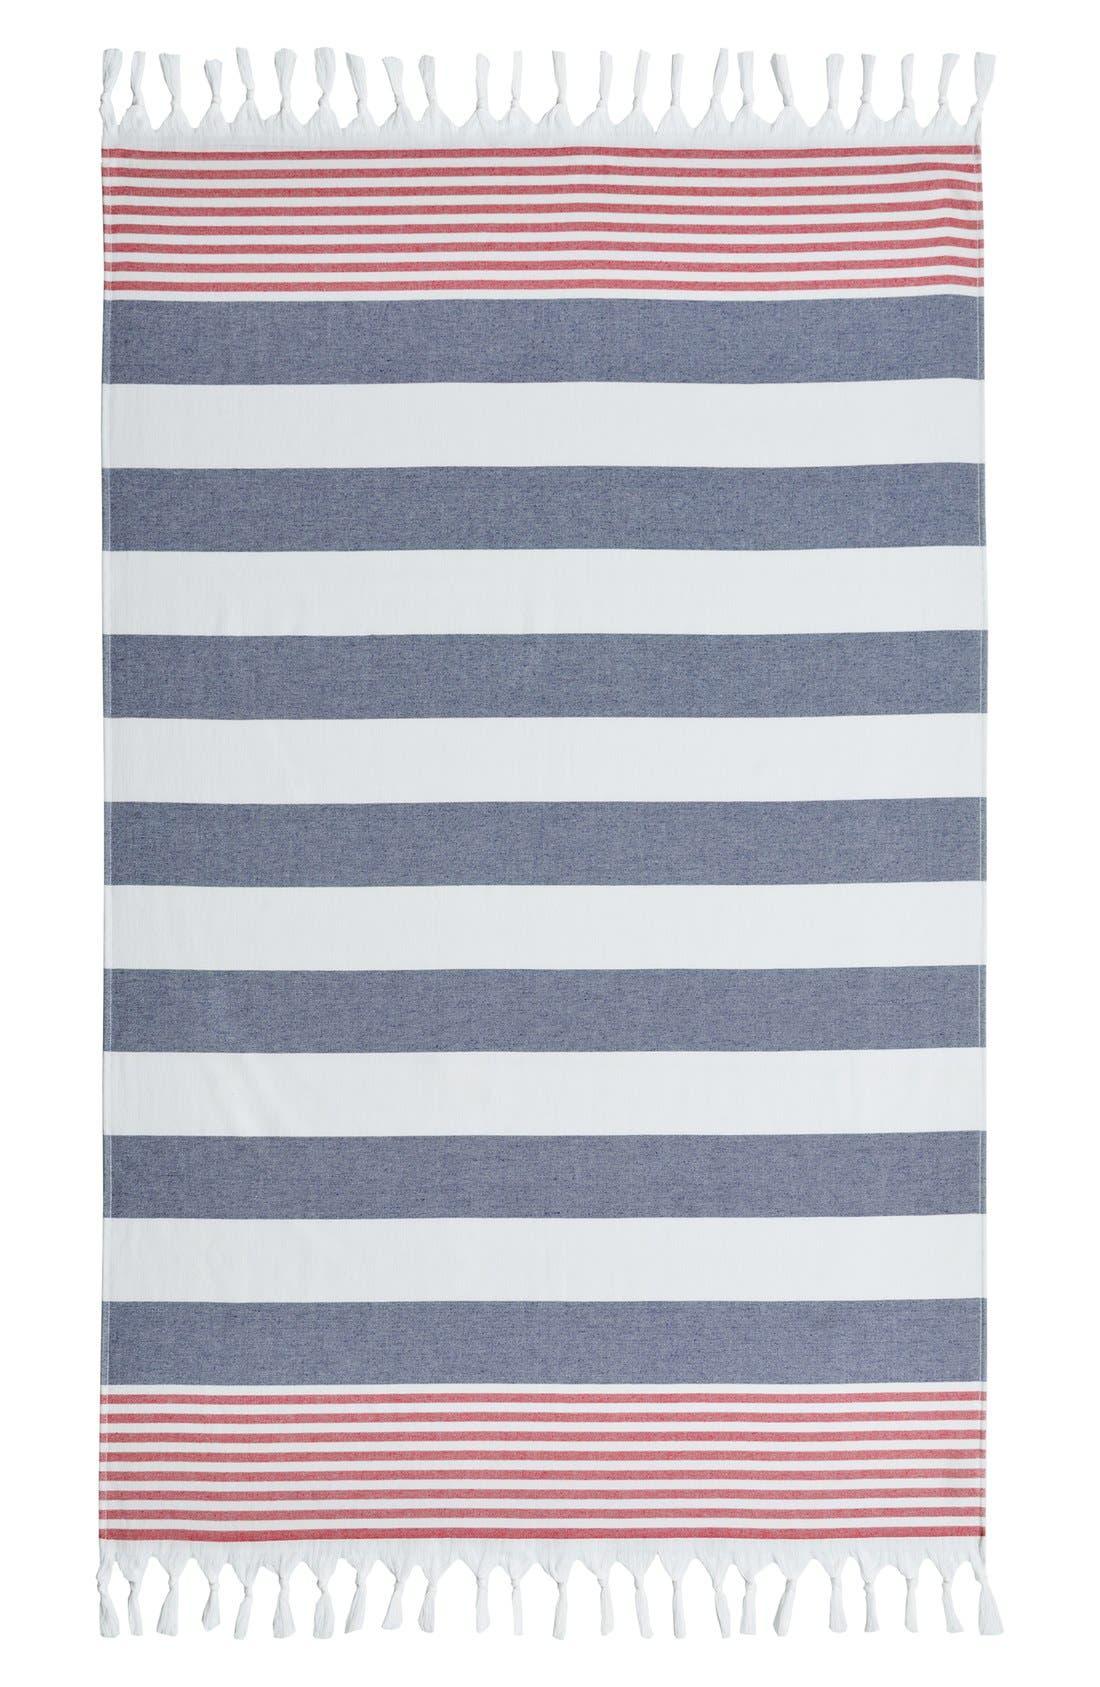 'Patriotic' Turkish Pestemal Towel,                             Alternate thumbnail 4, color,                             OCEAN BLUE